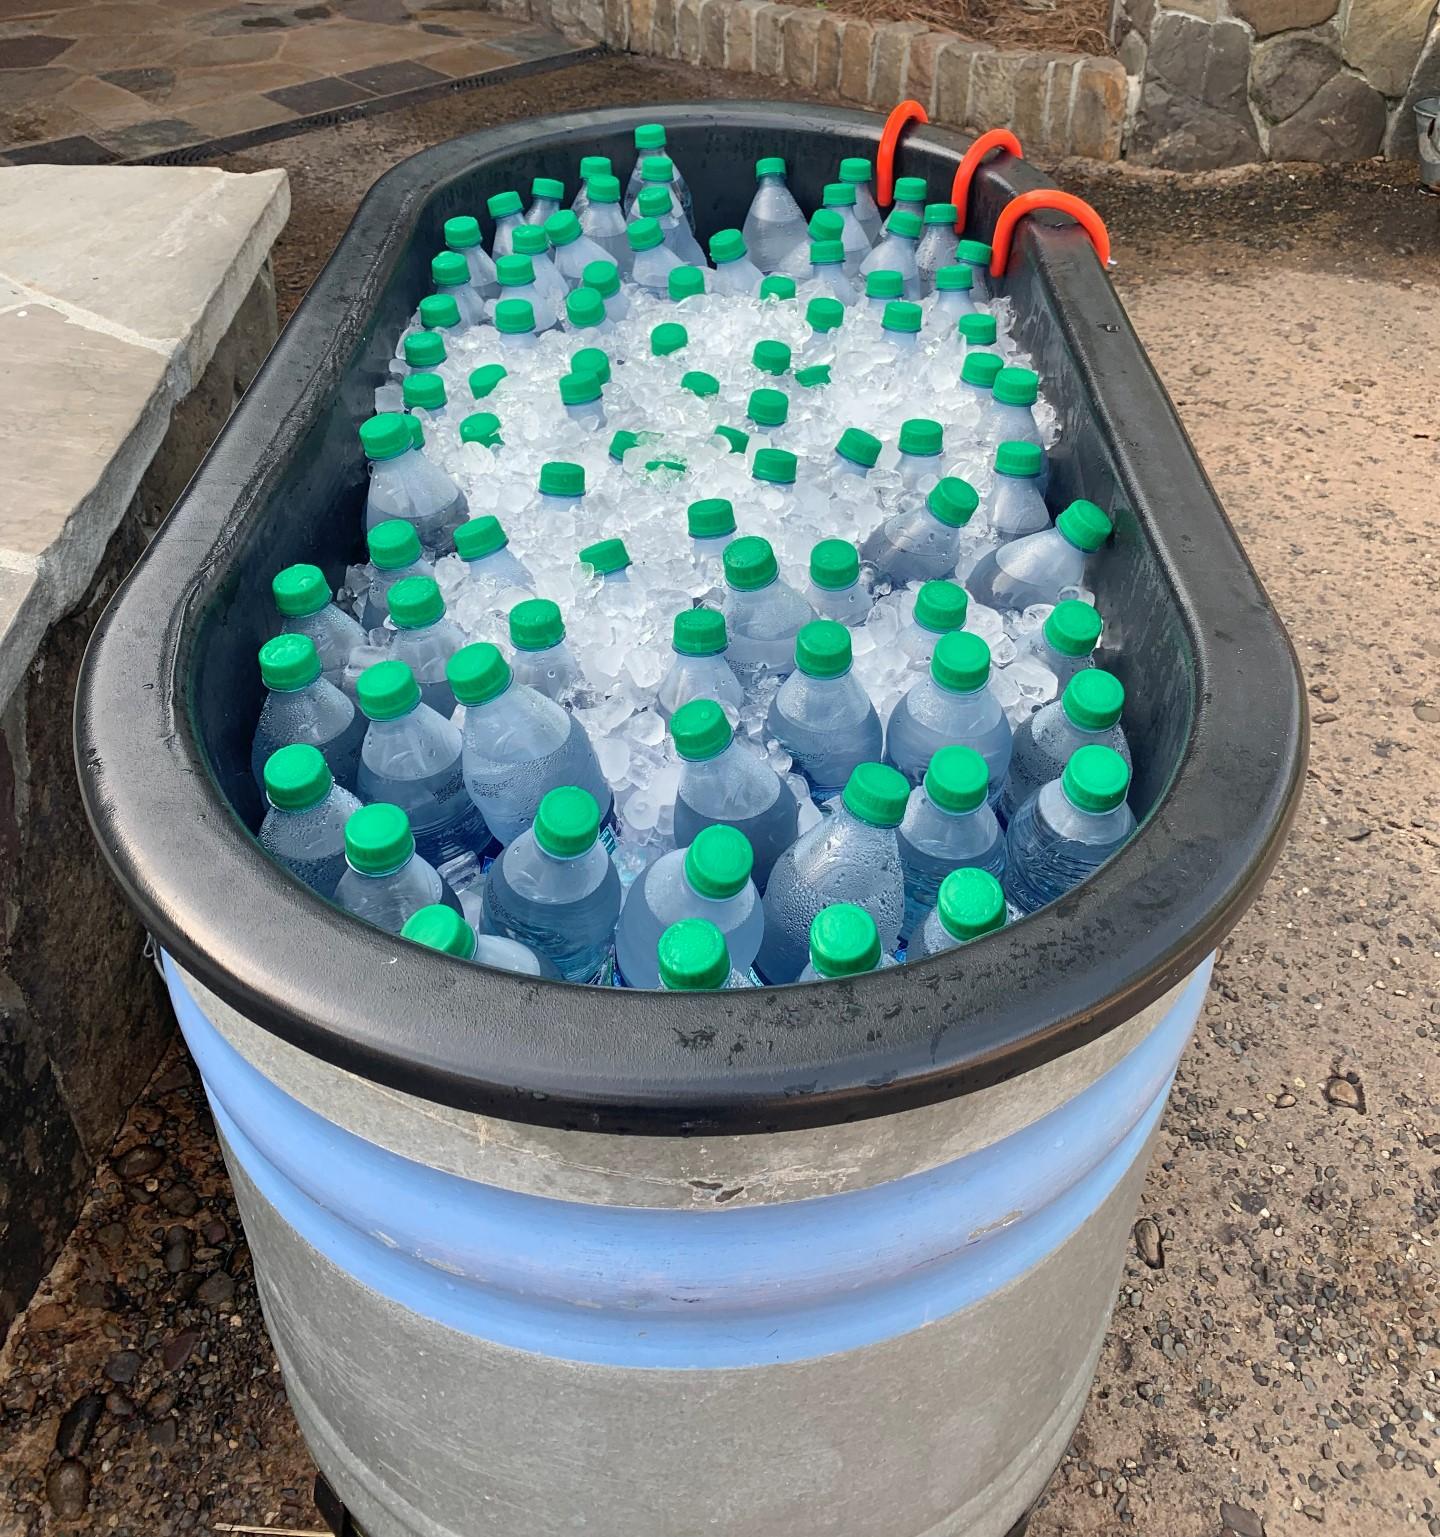 water-bottles-disney-world-orlando-florida